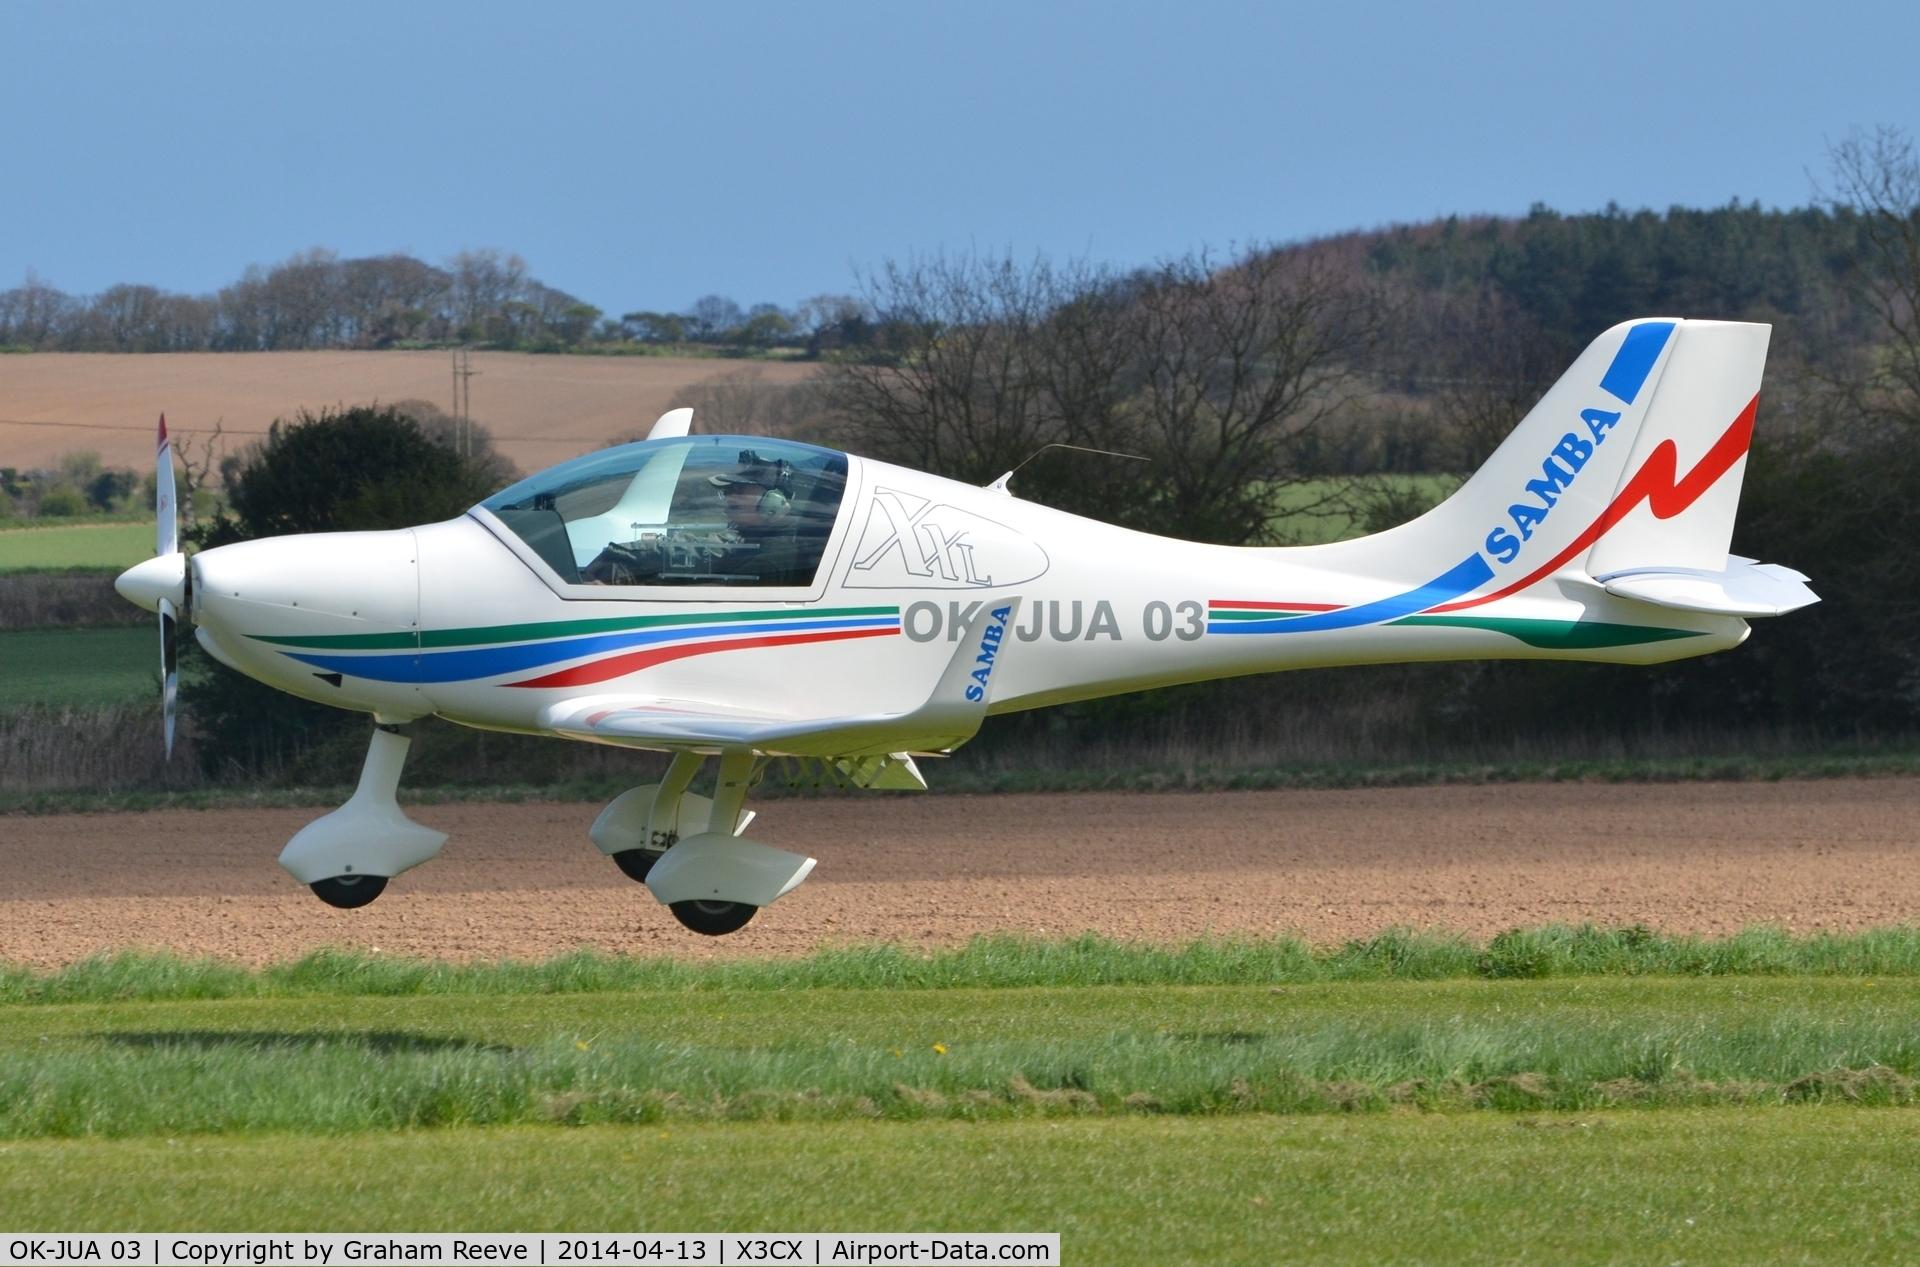 OK-JUA 03, Urban Air UFM-10 Samba C/N Not found OK-JUA 03, About to touch down at Northrepps.